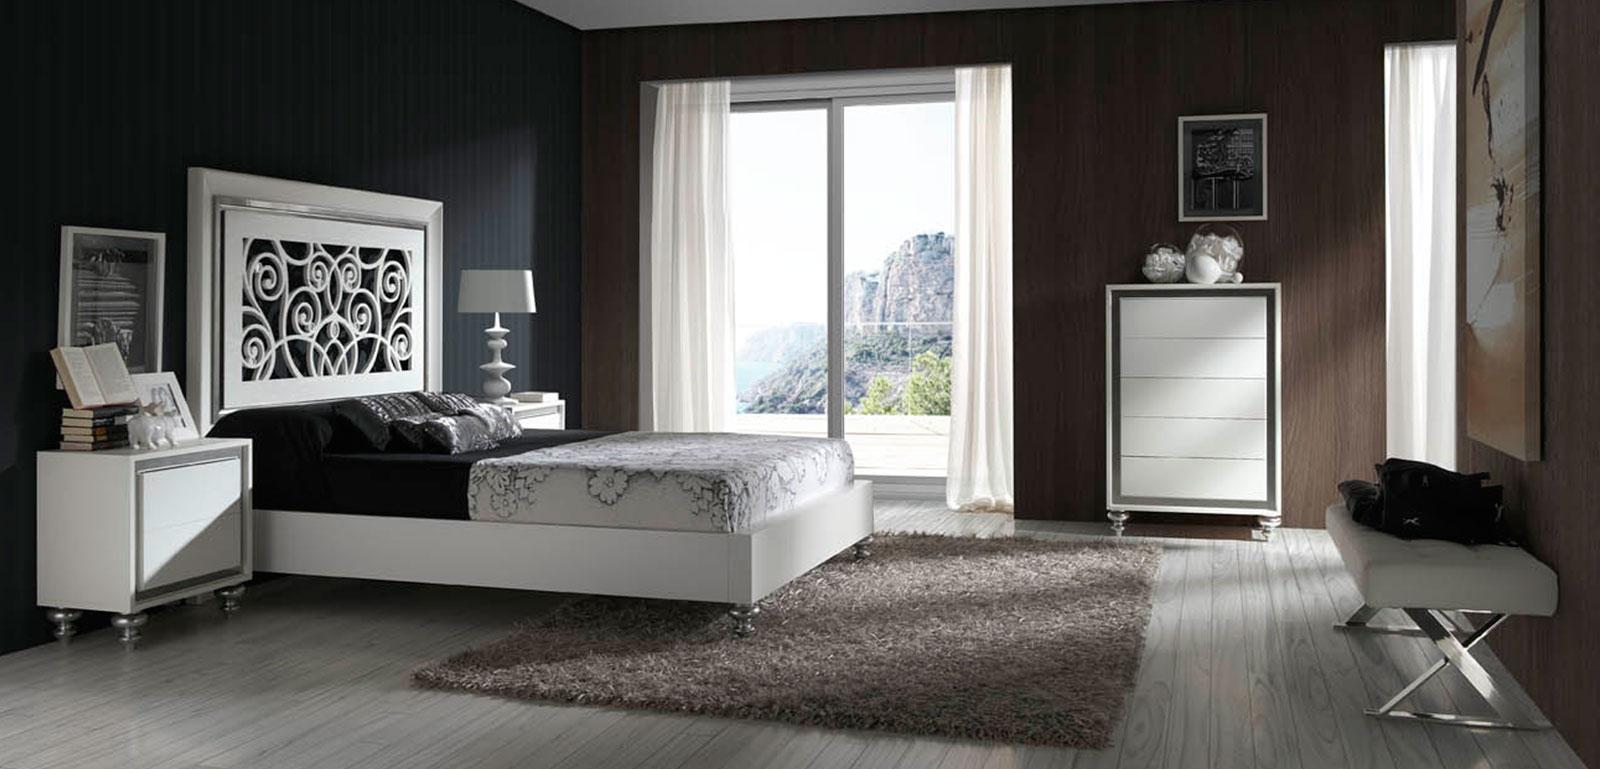 muebles monrabal chirivella camas colecci n alba